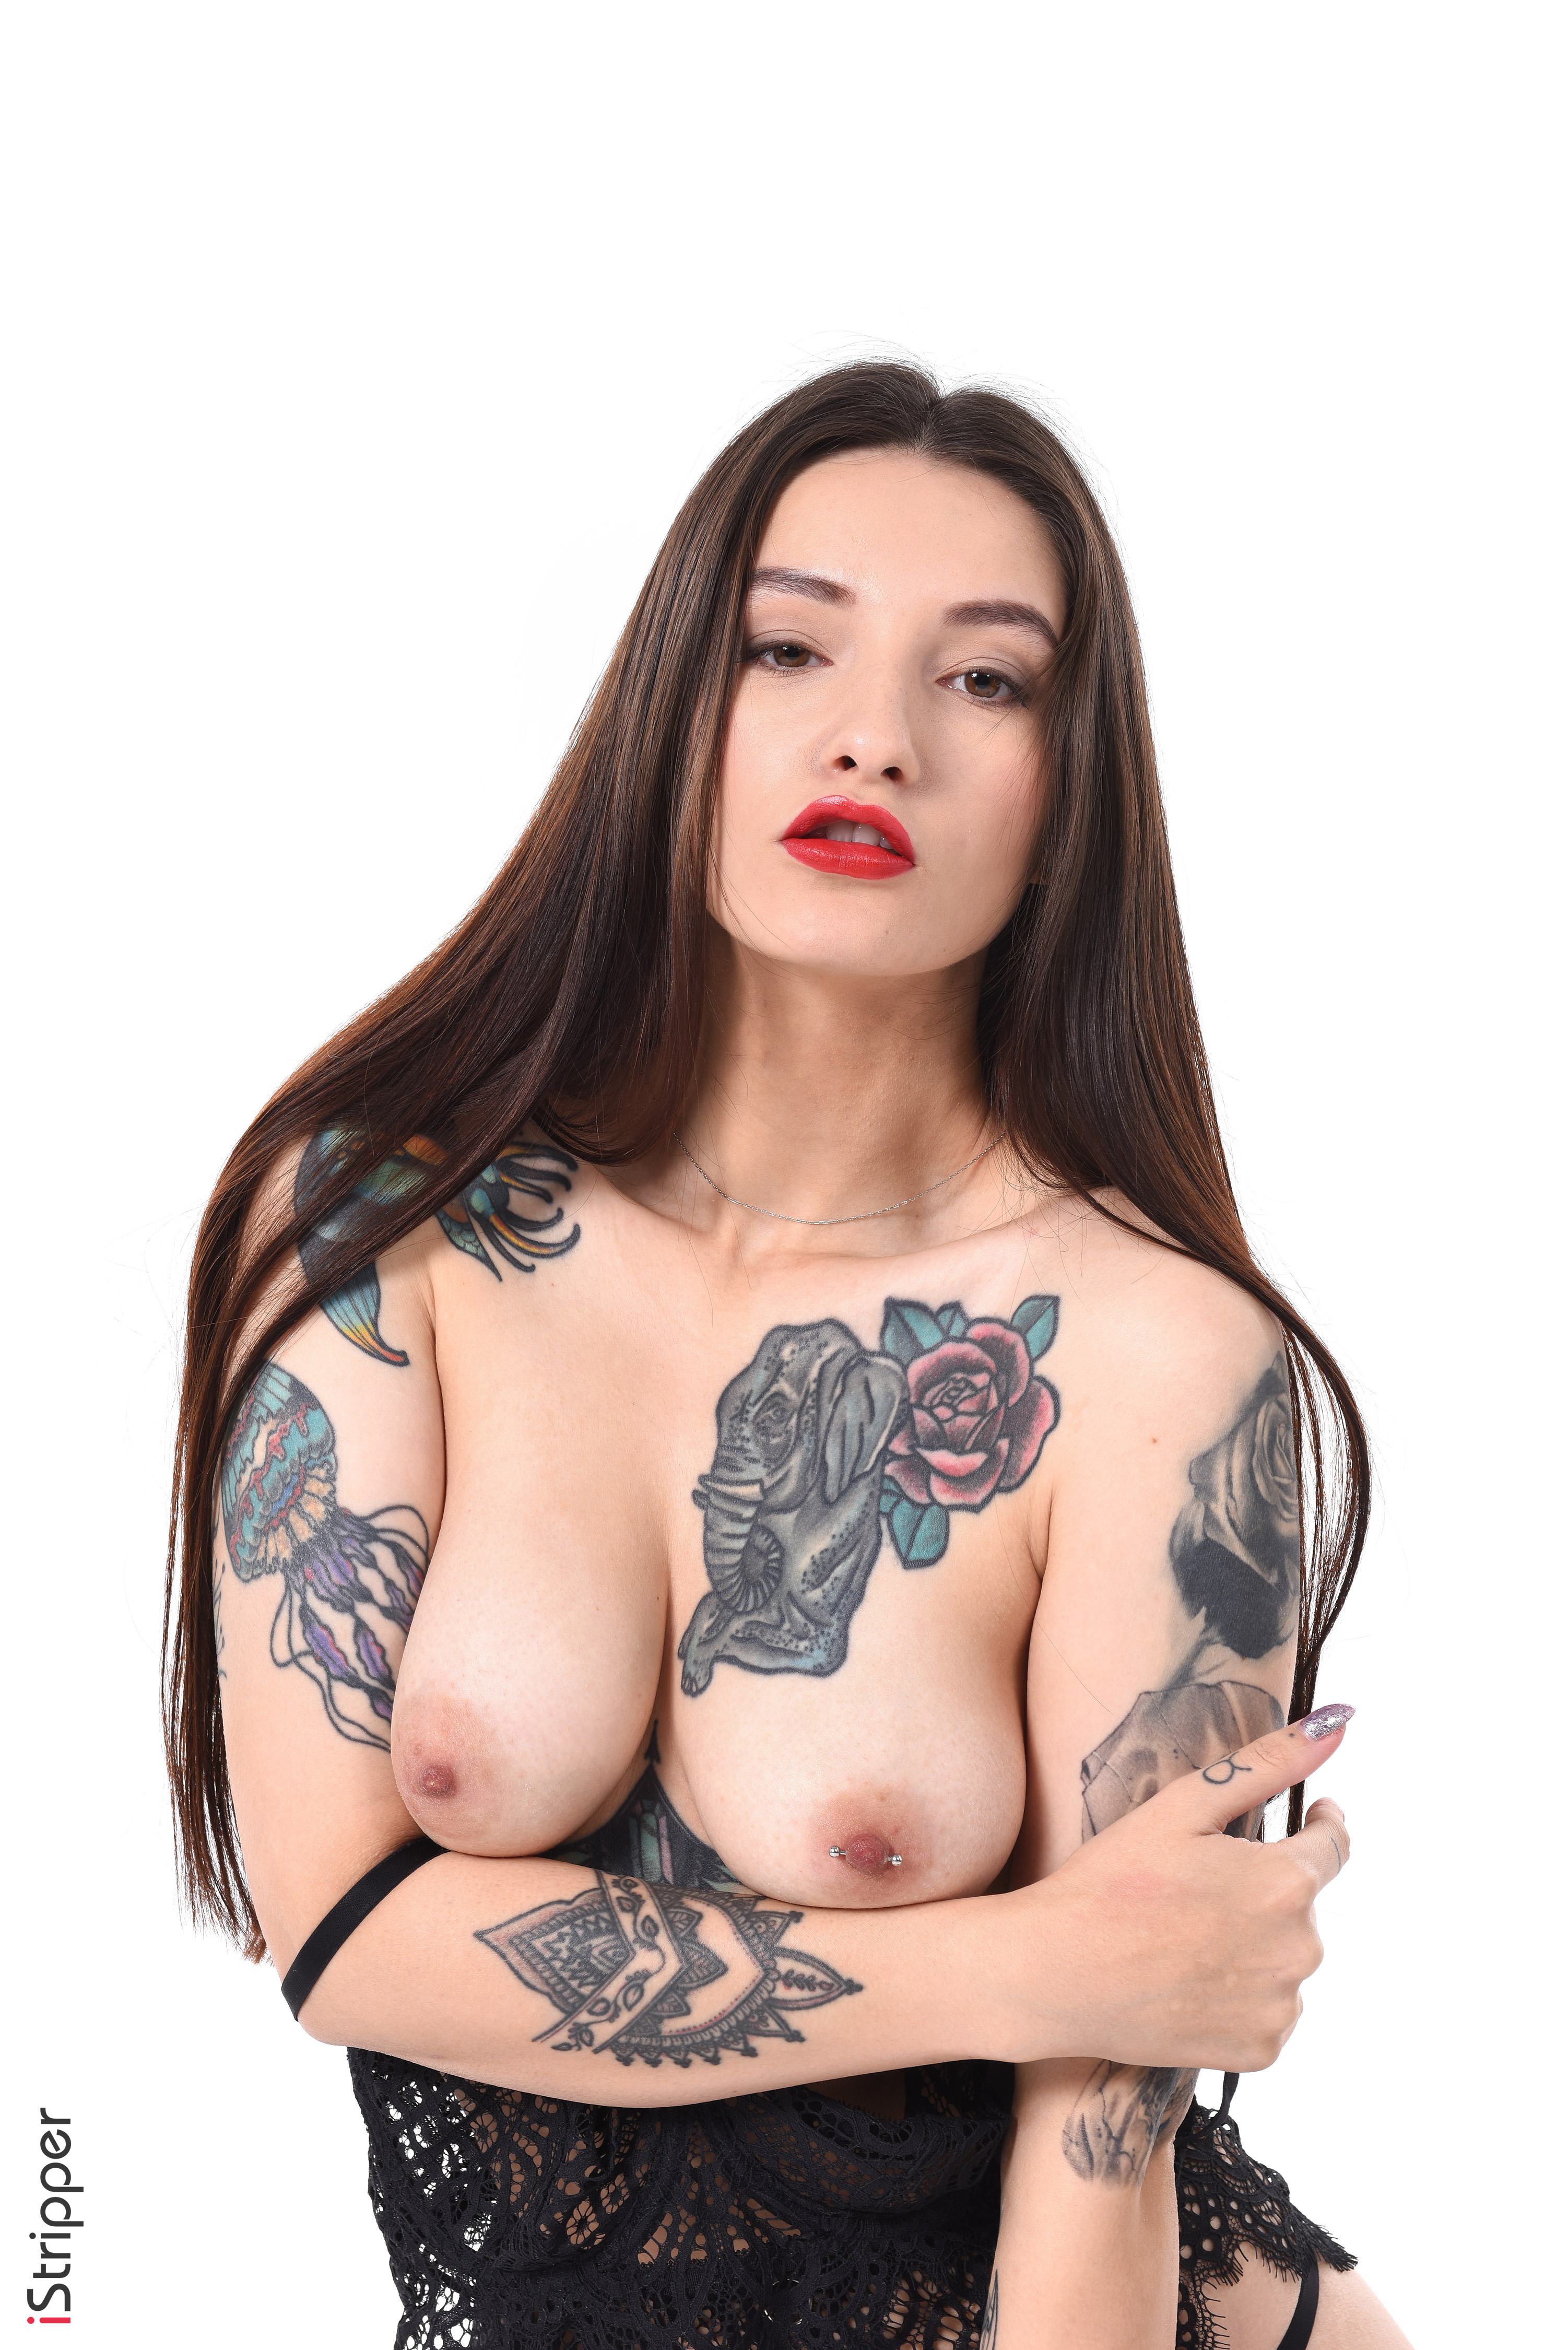 nicole foundry cams sexy bath striptease nude